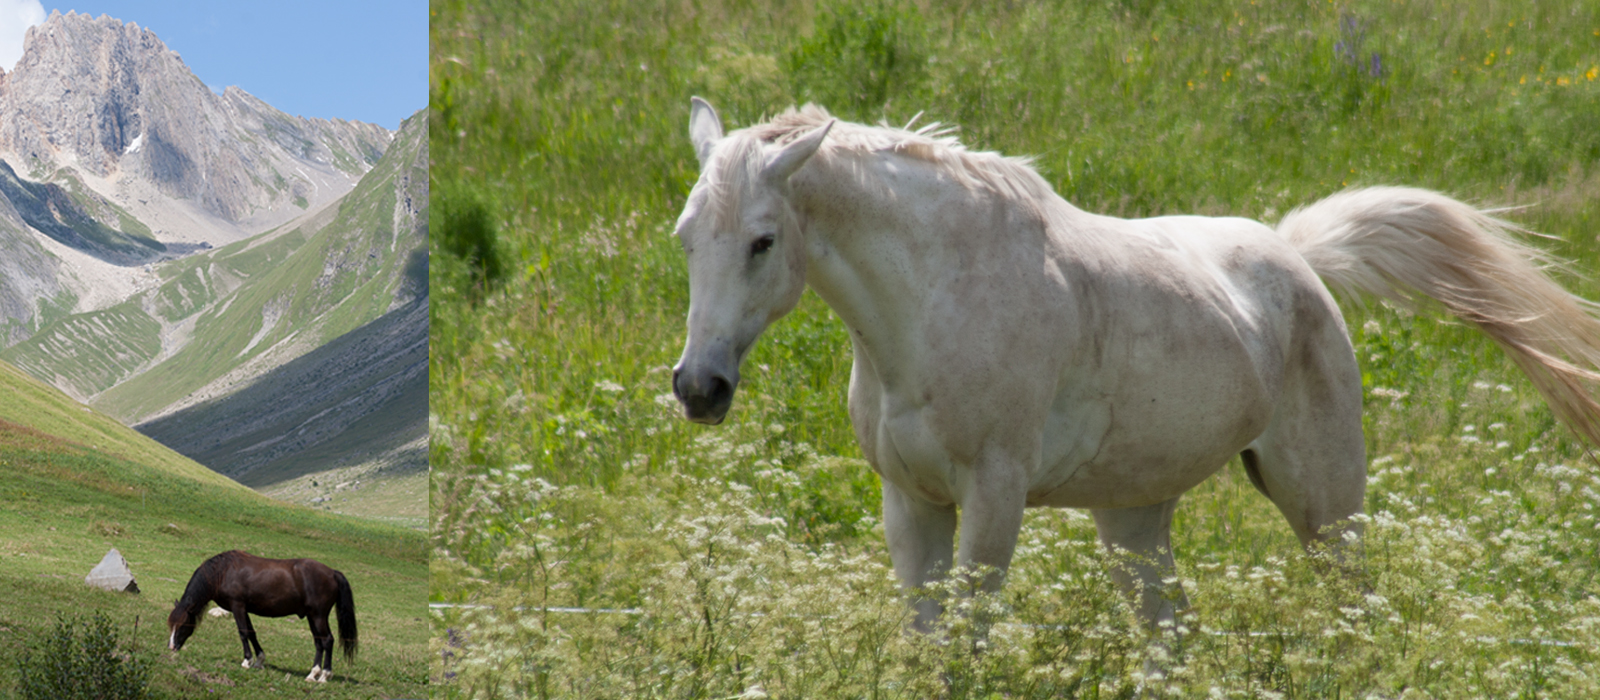 chevaux-7 copie